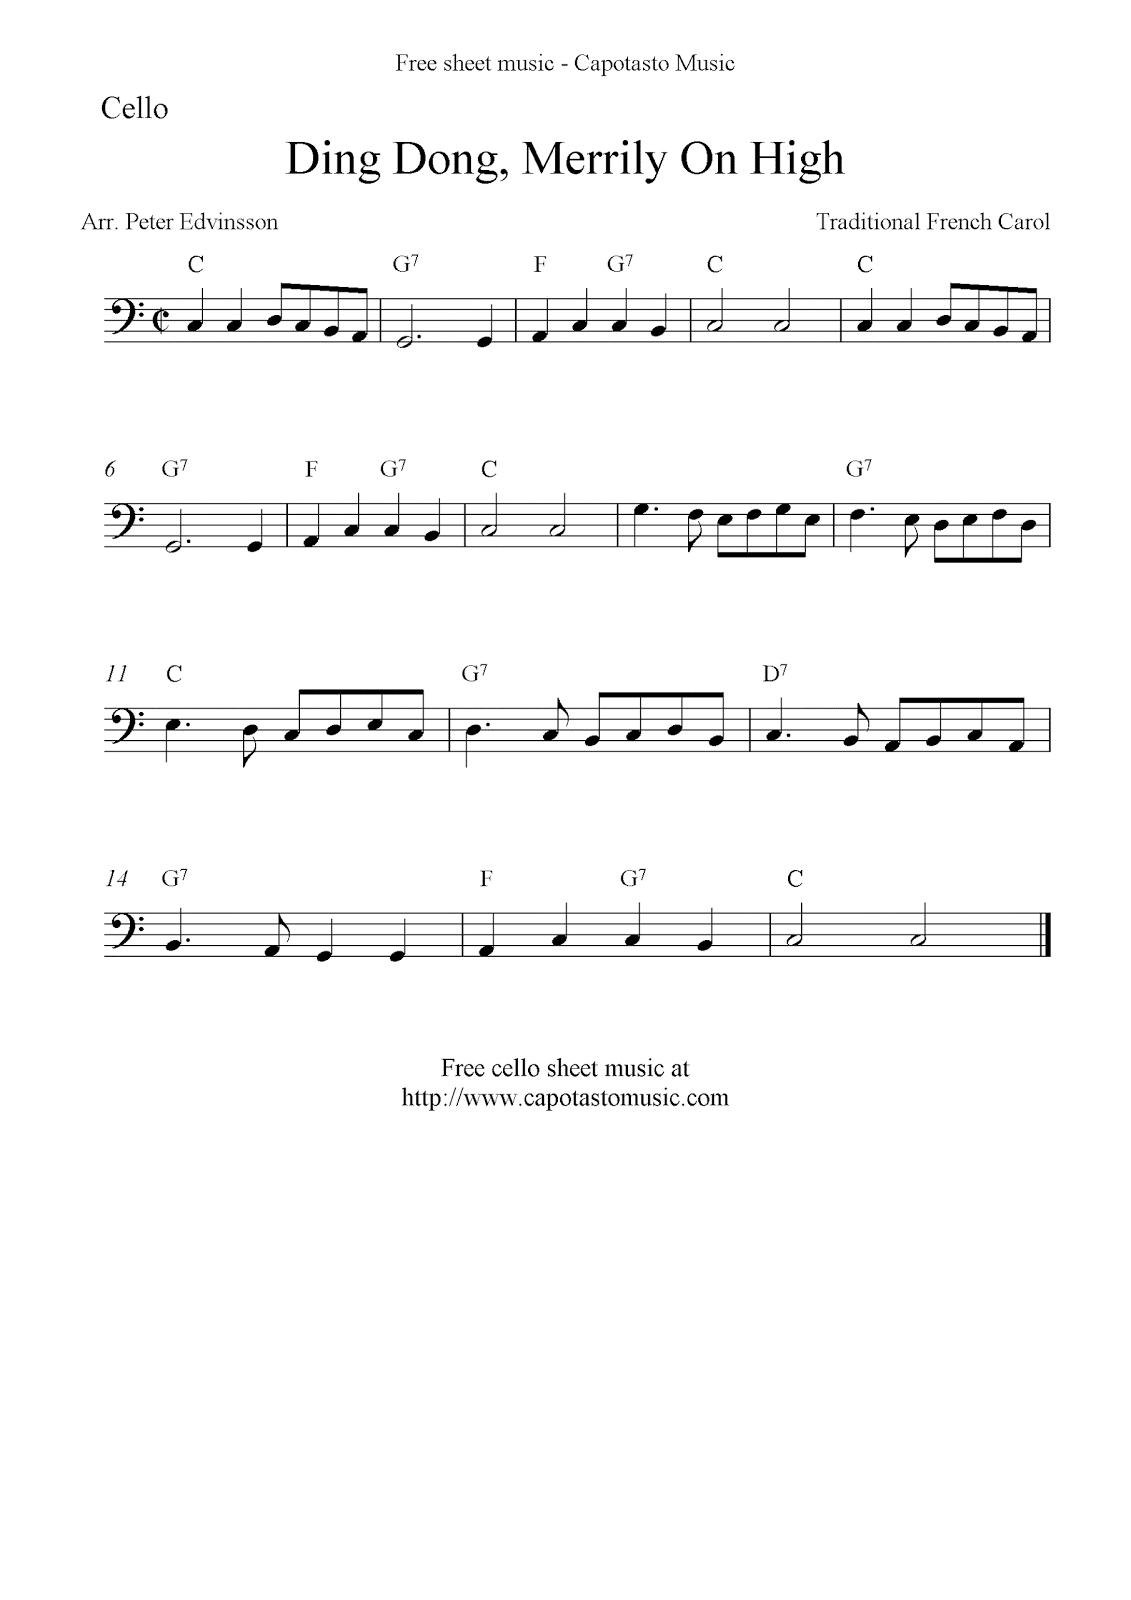 Free Christmas Cello Sheet Music